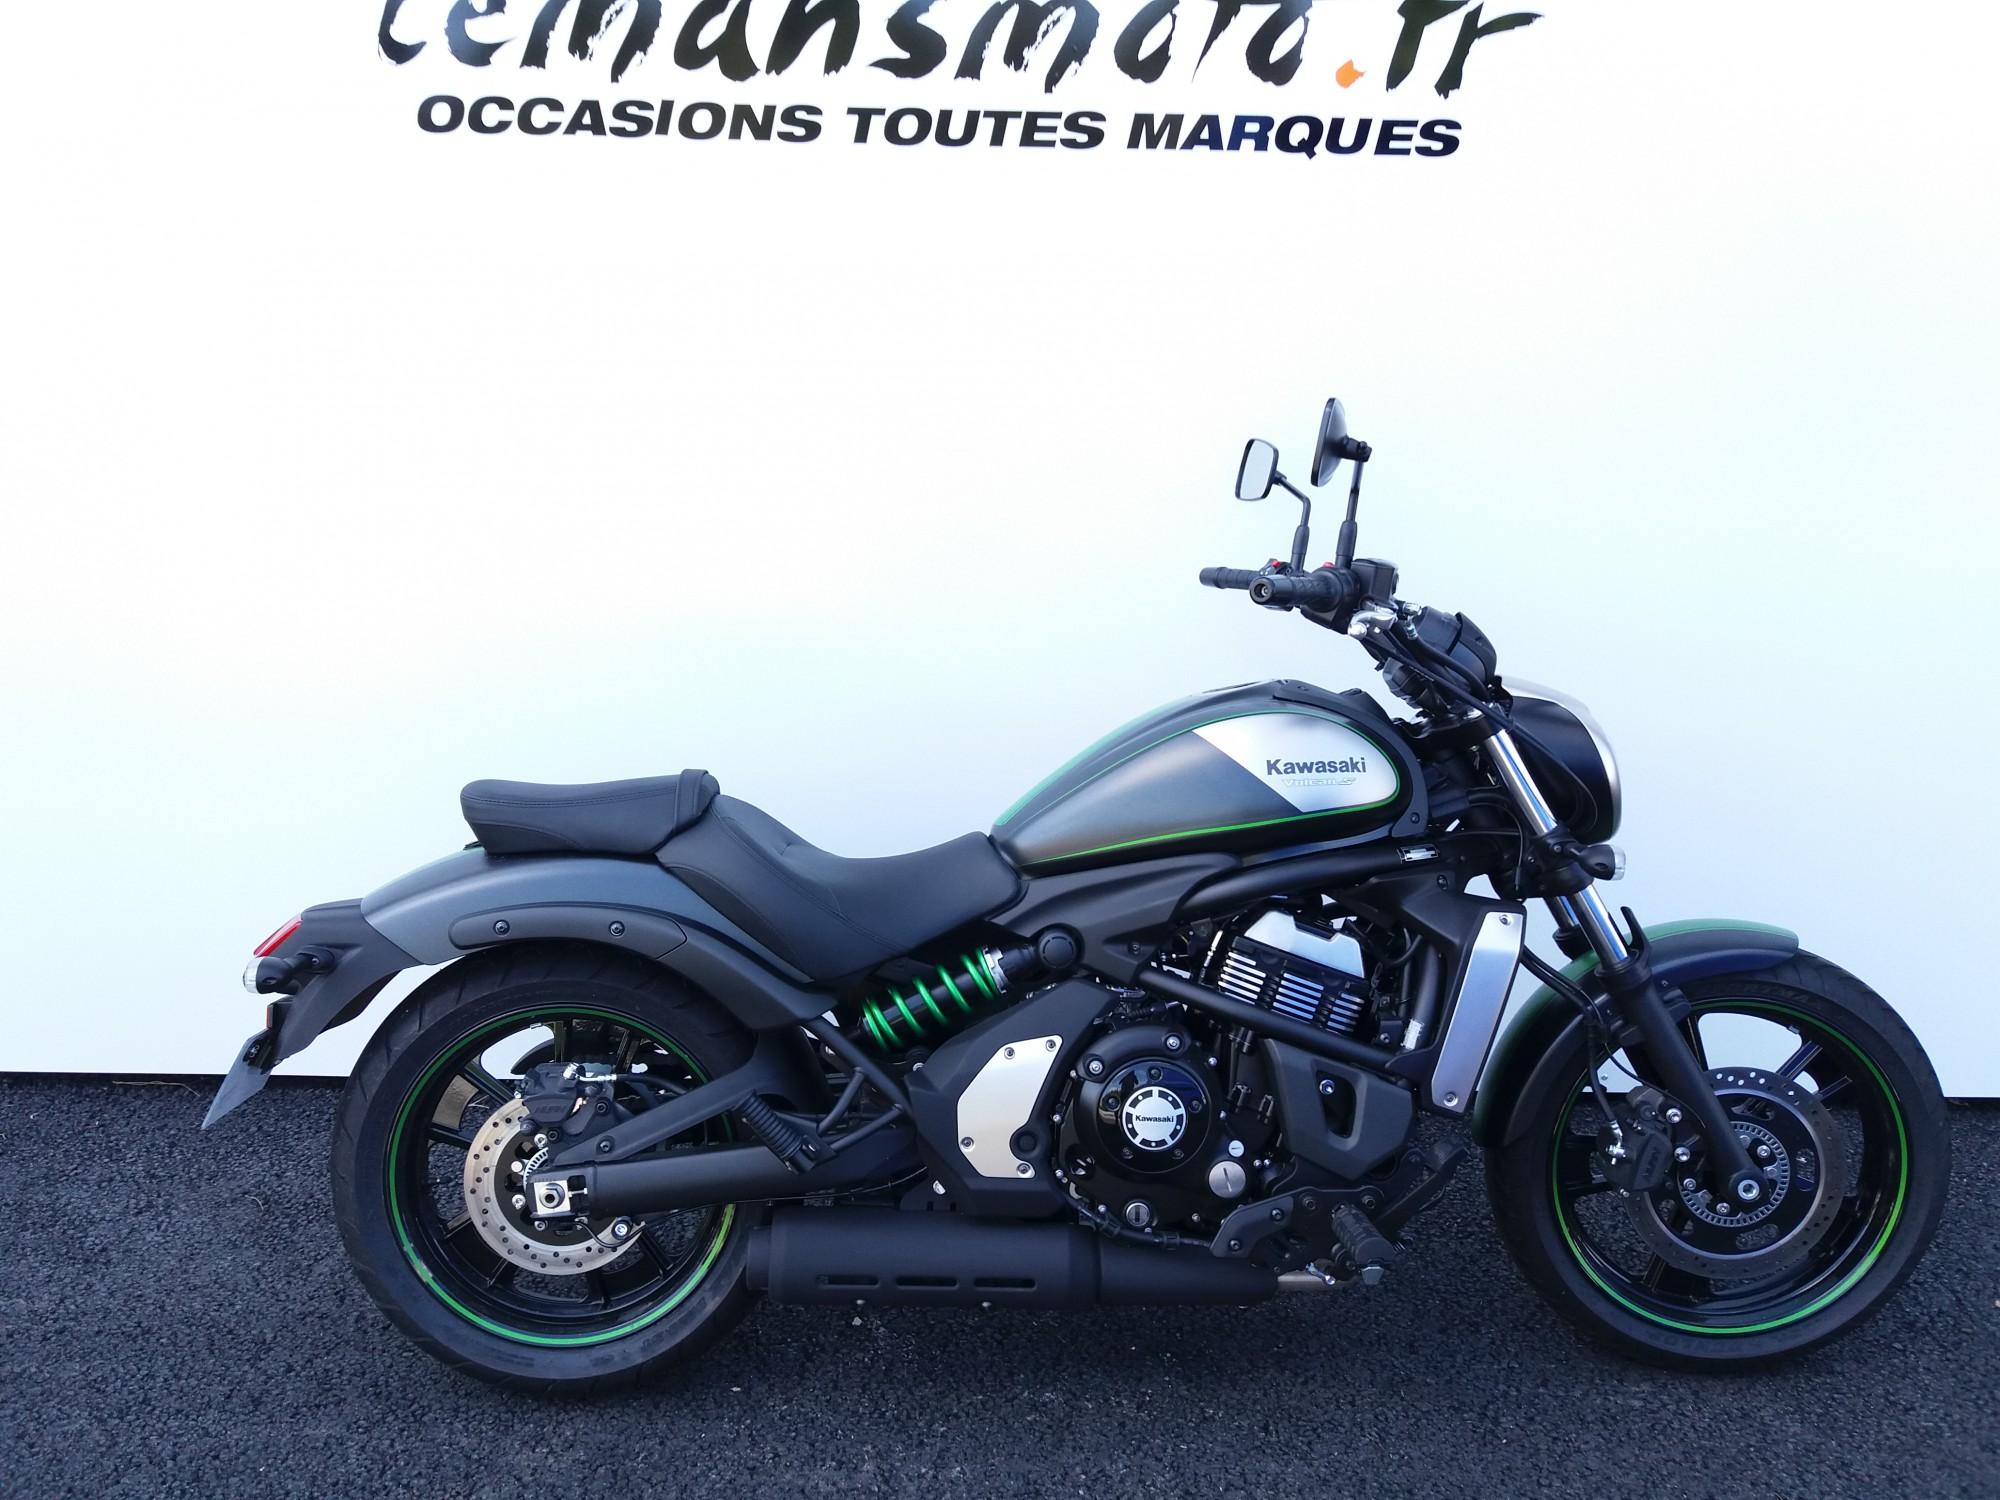 kawasaki moto bordeaux occasion auto moto et pi ce auto. Black Bedroom Furniture Sets. Home Design Ideas